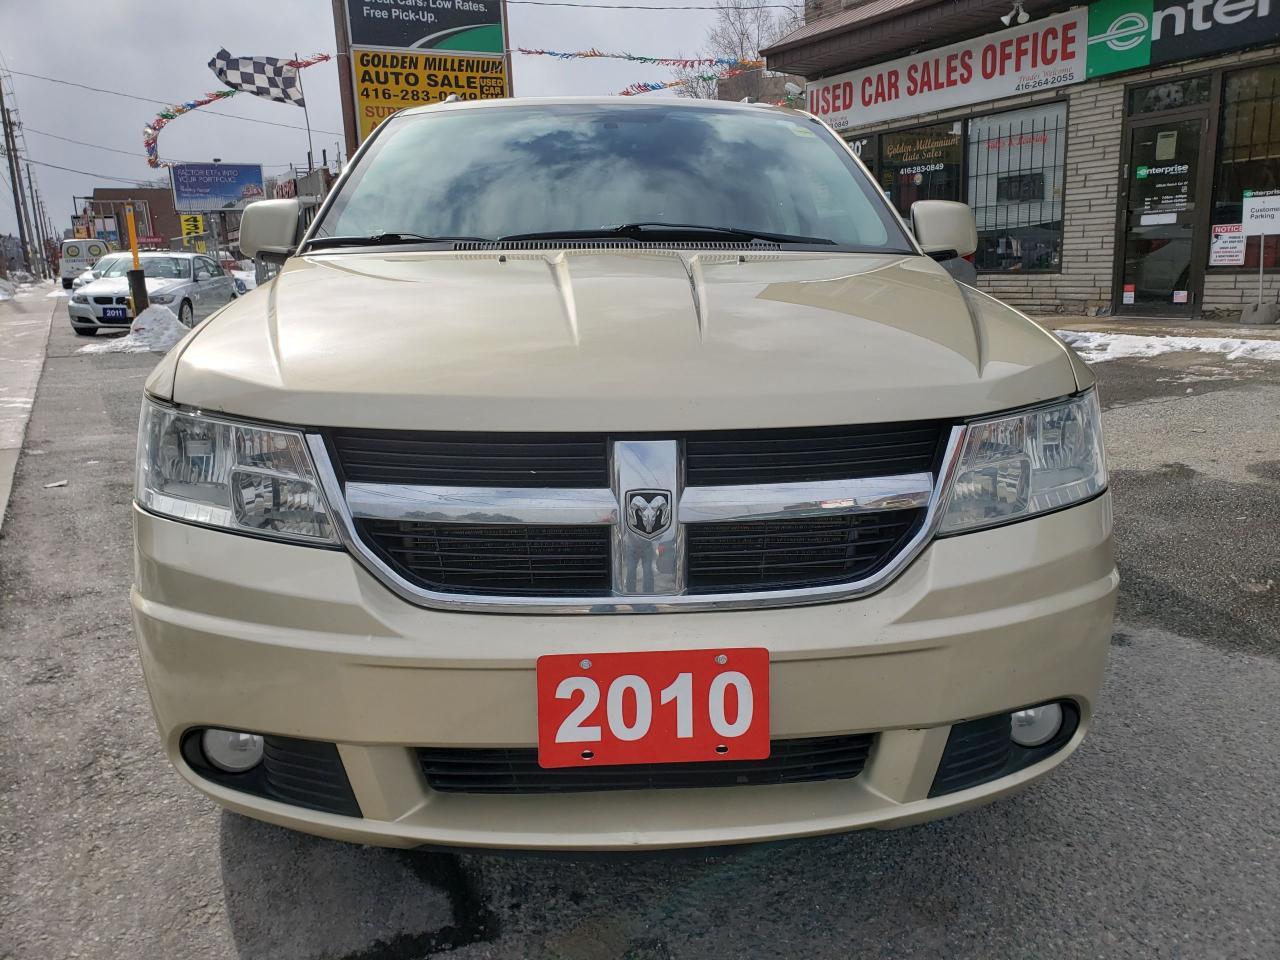 2010 Dodge Journey SXT / 7 Passanger -Sunroof- Bluetooth-Fully Loaded